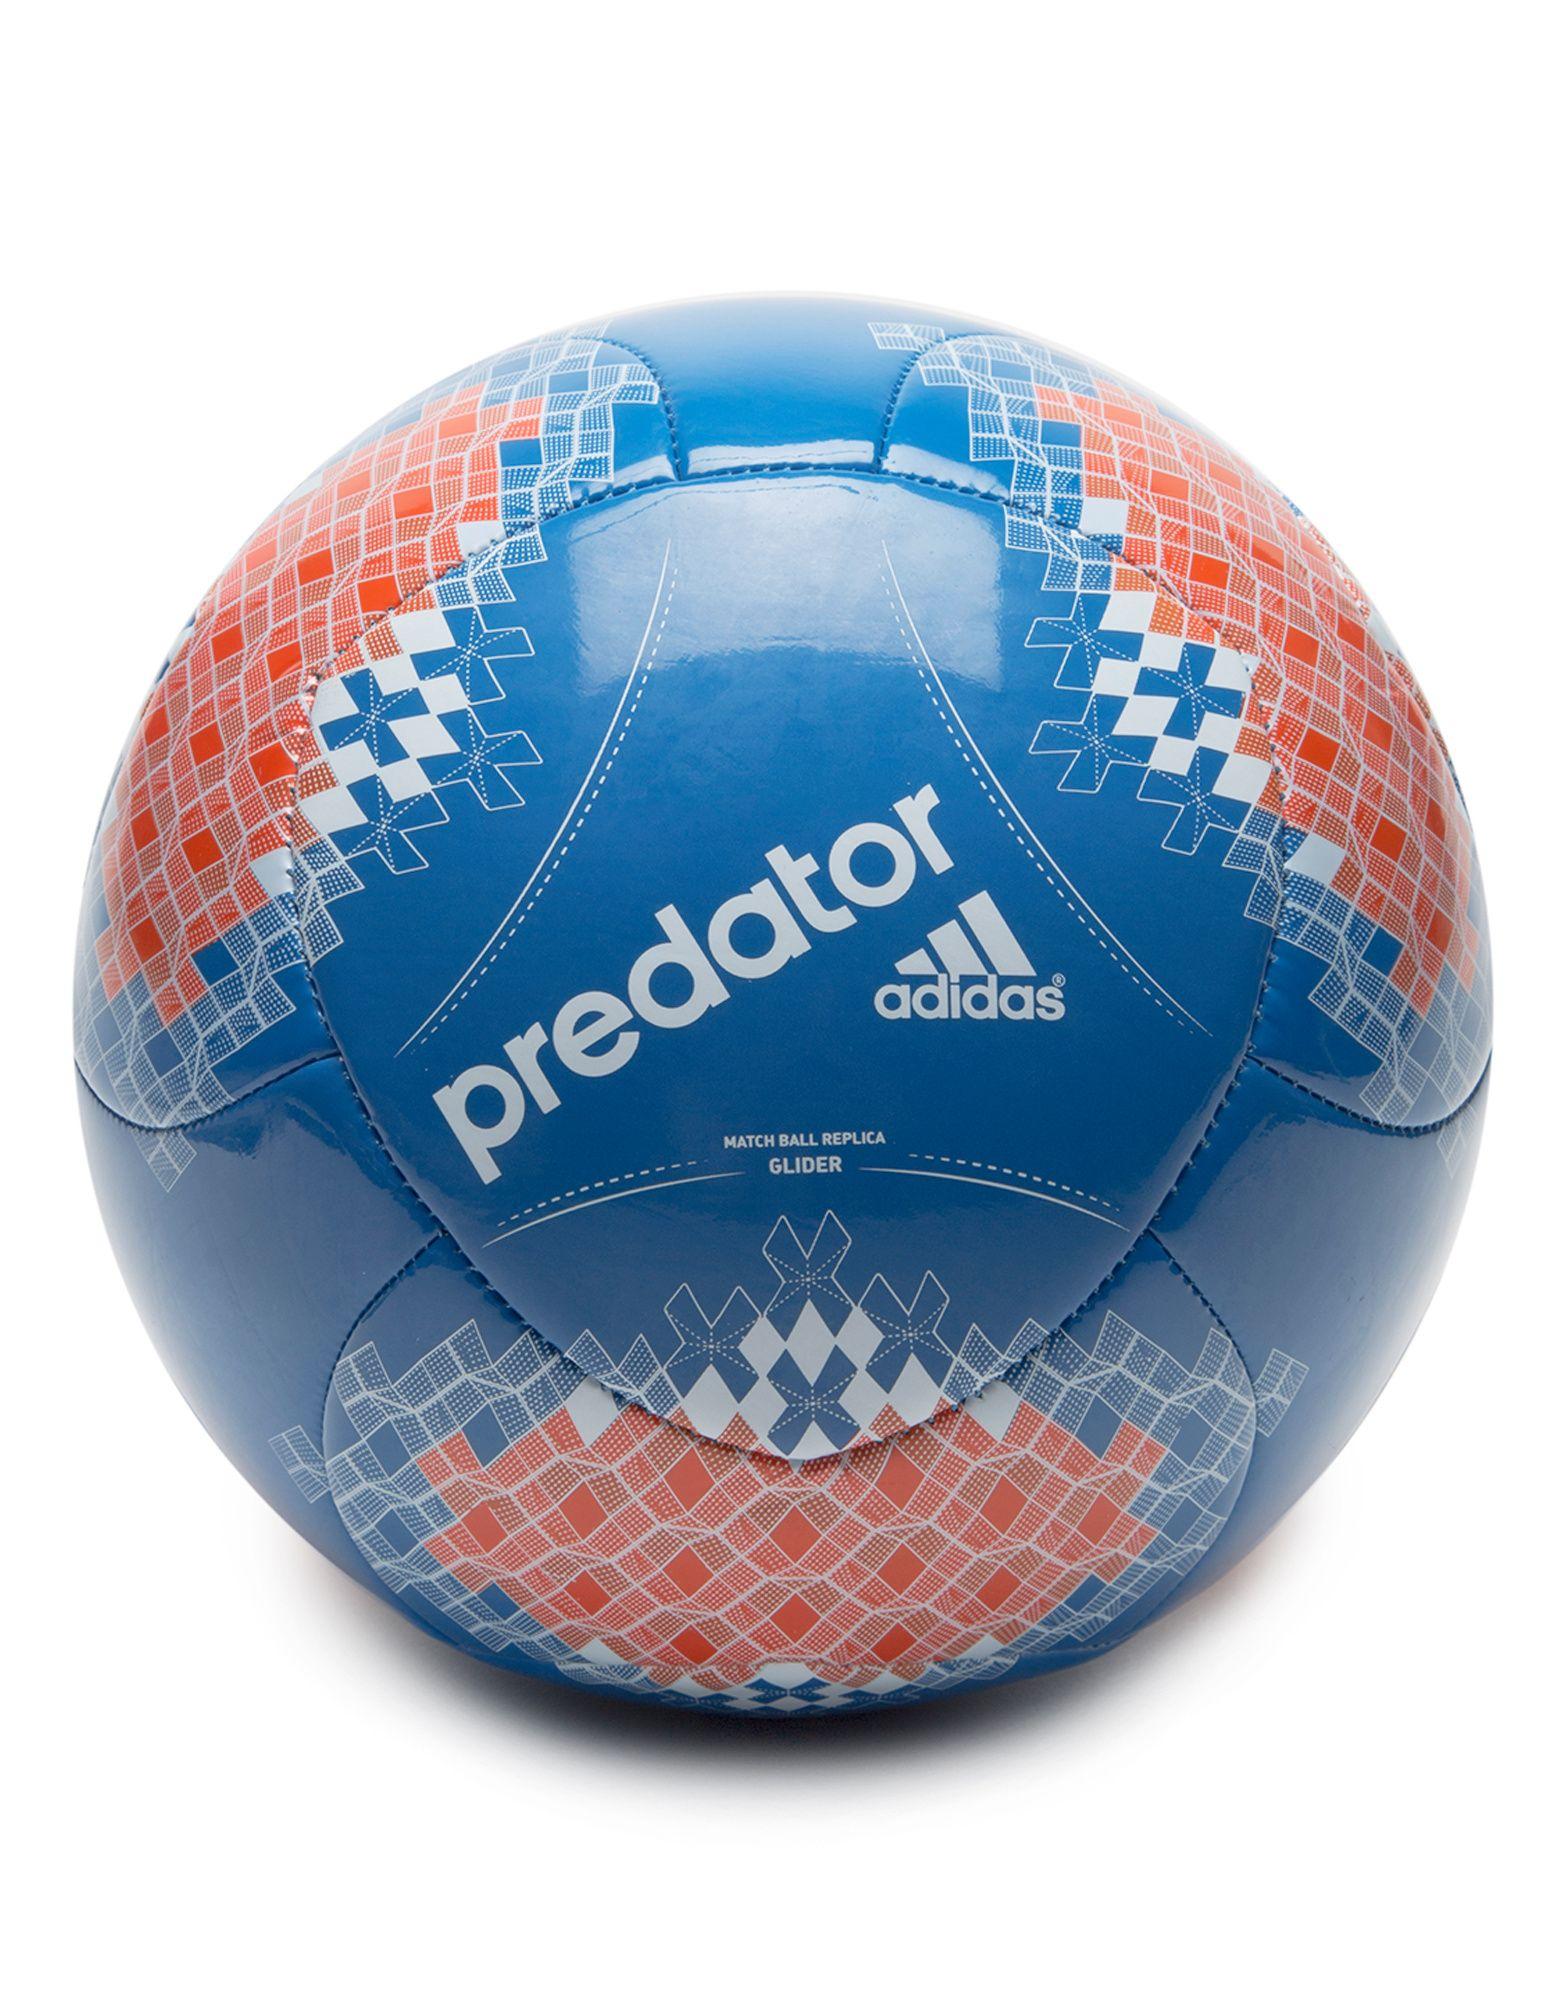 adidas Predator Football